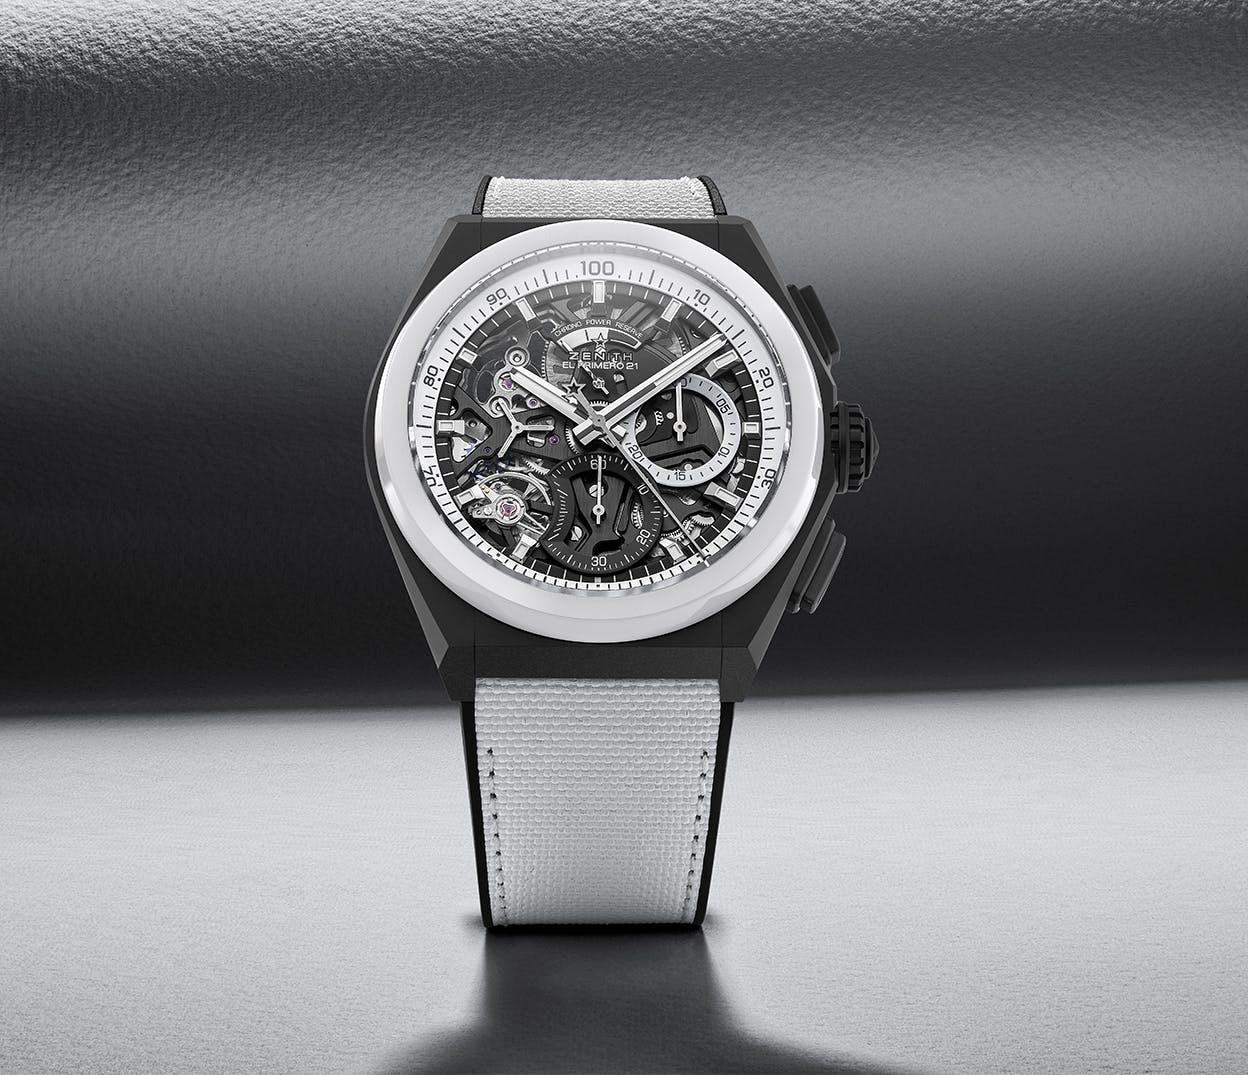 ZENITH真力时特别呈献两款大胆瞩目的精美腕表,DEFY 21和DEFY Classic经典黑白腕表